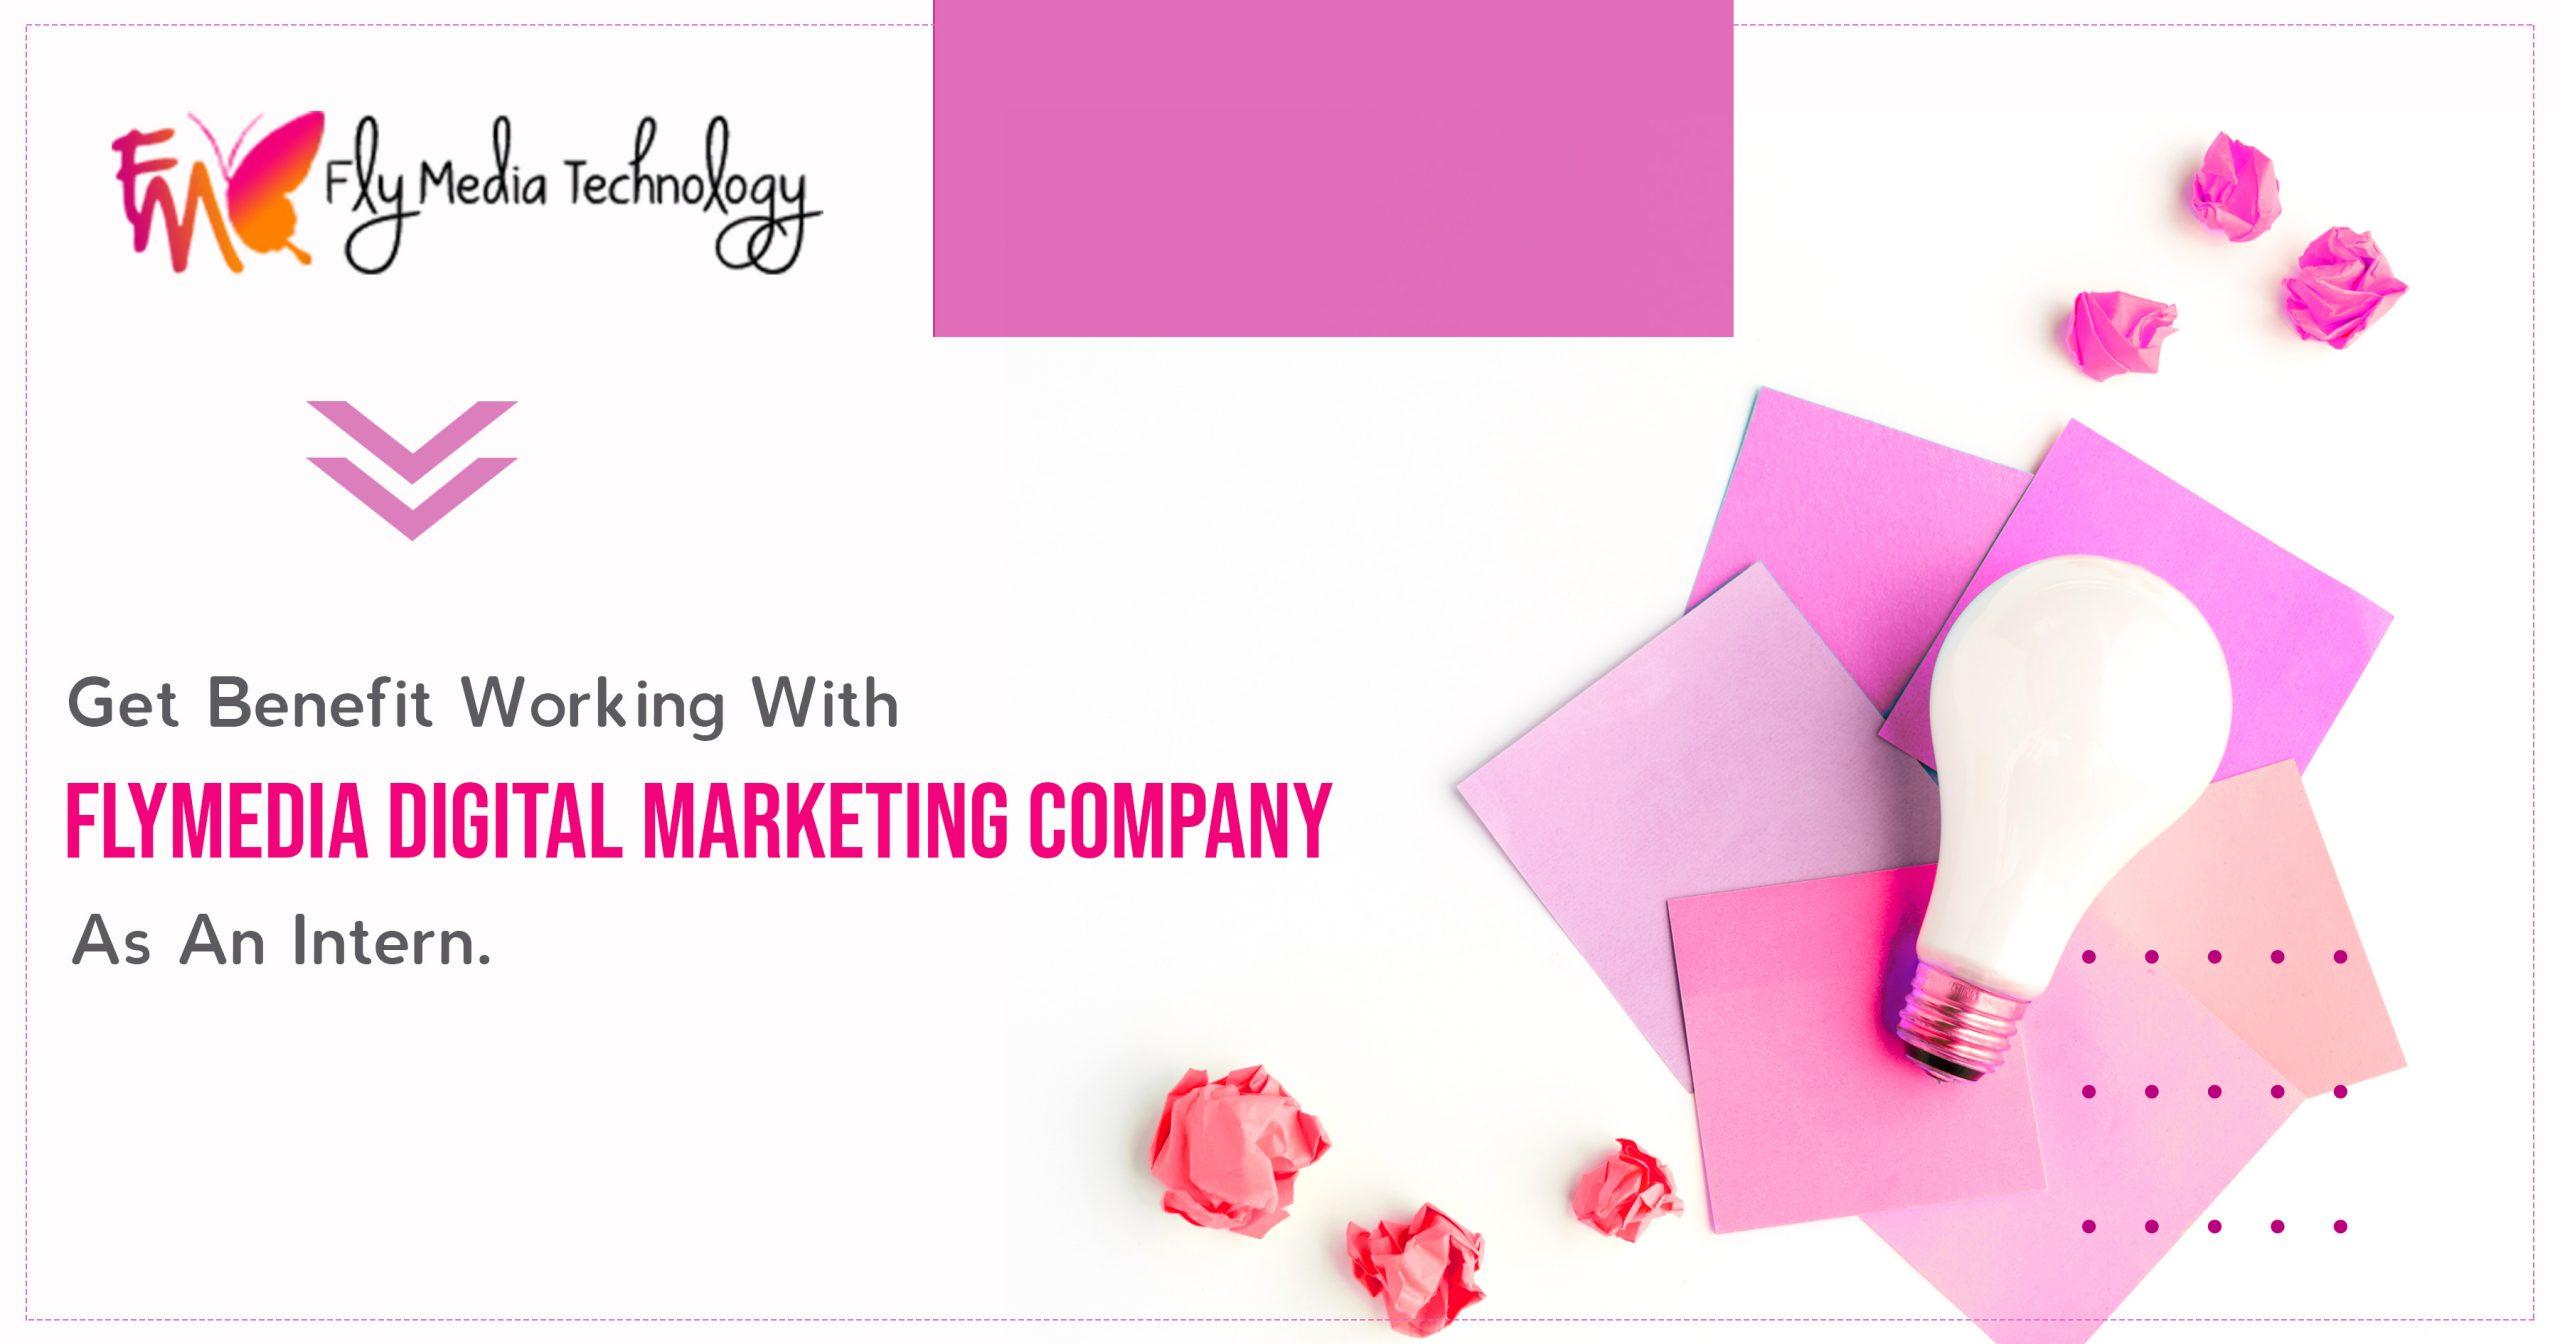 Flymedia digital marketing company internship